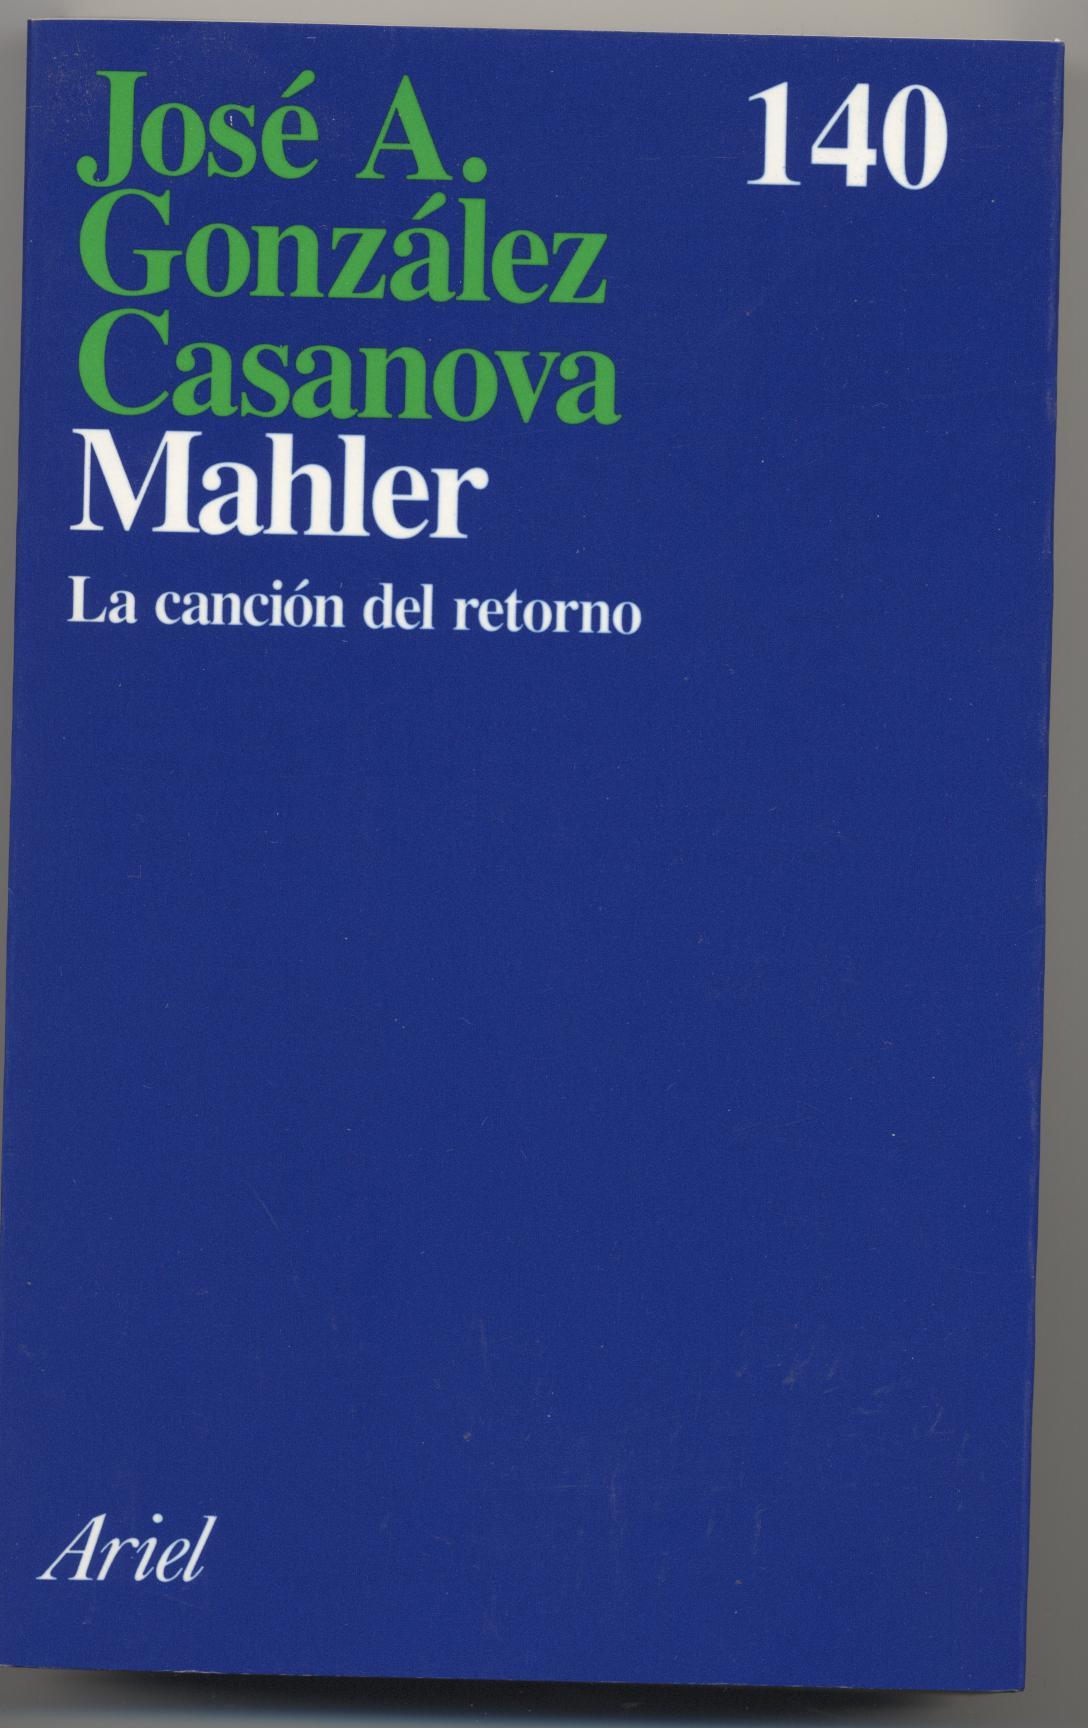 Mahler, la cancion del retorno